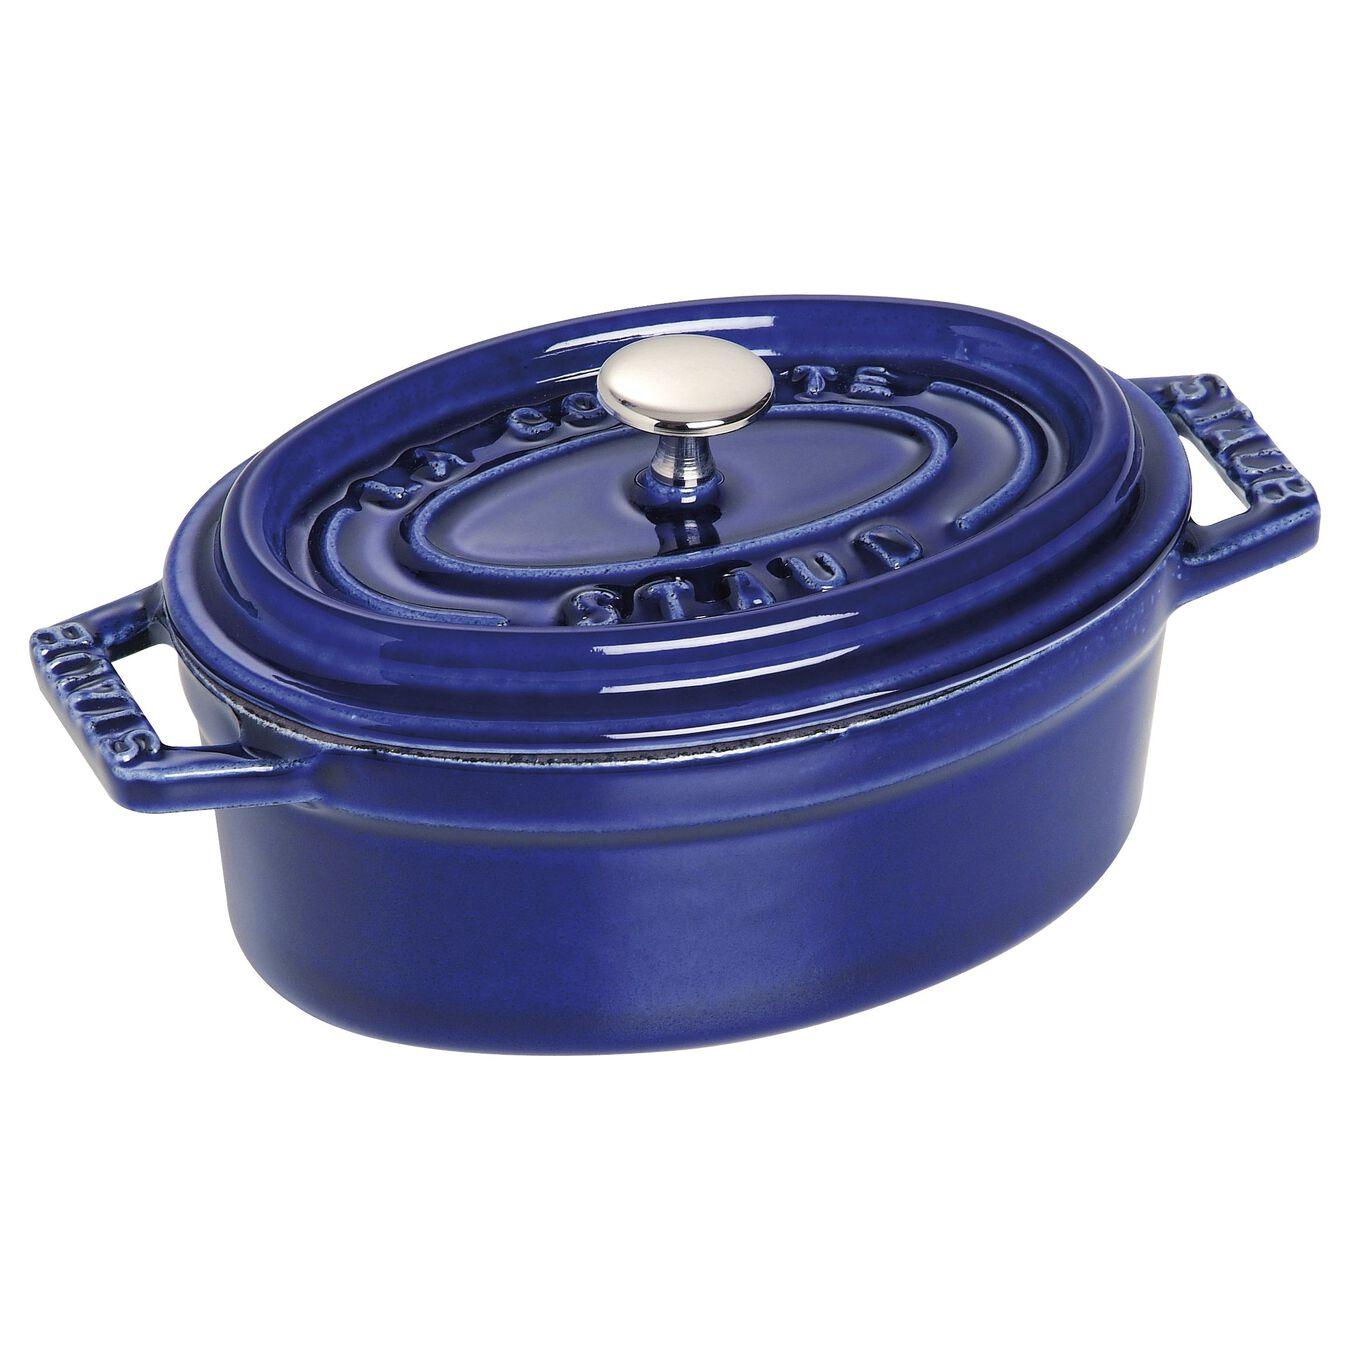 250 ml Cast iron oval Mini Cocotte, Dark-Blue,,large 2